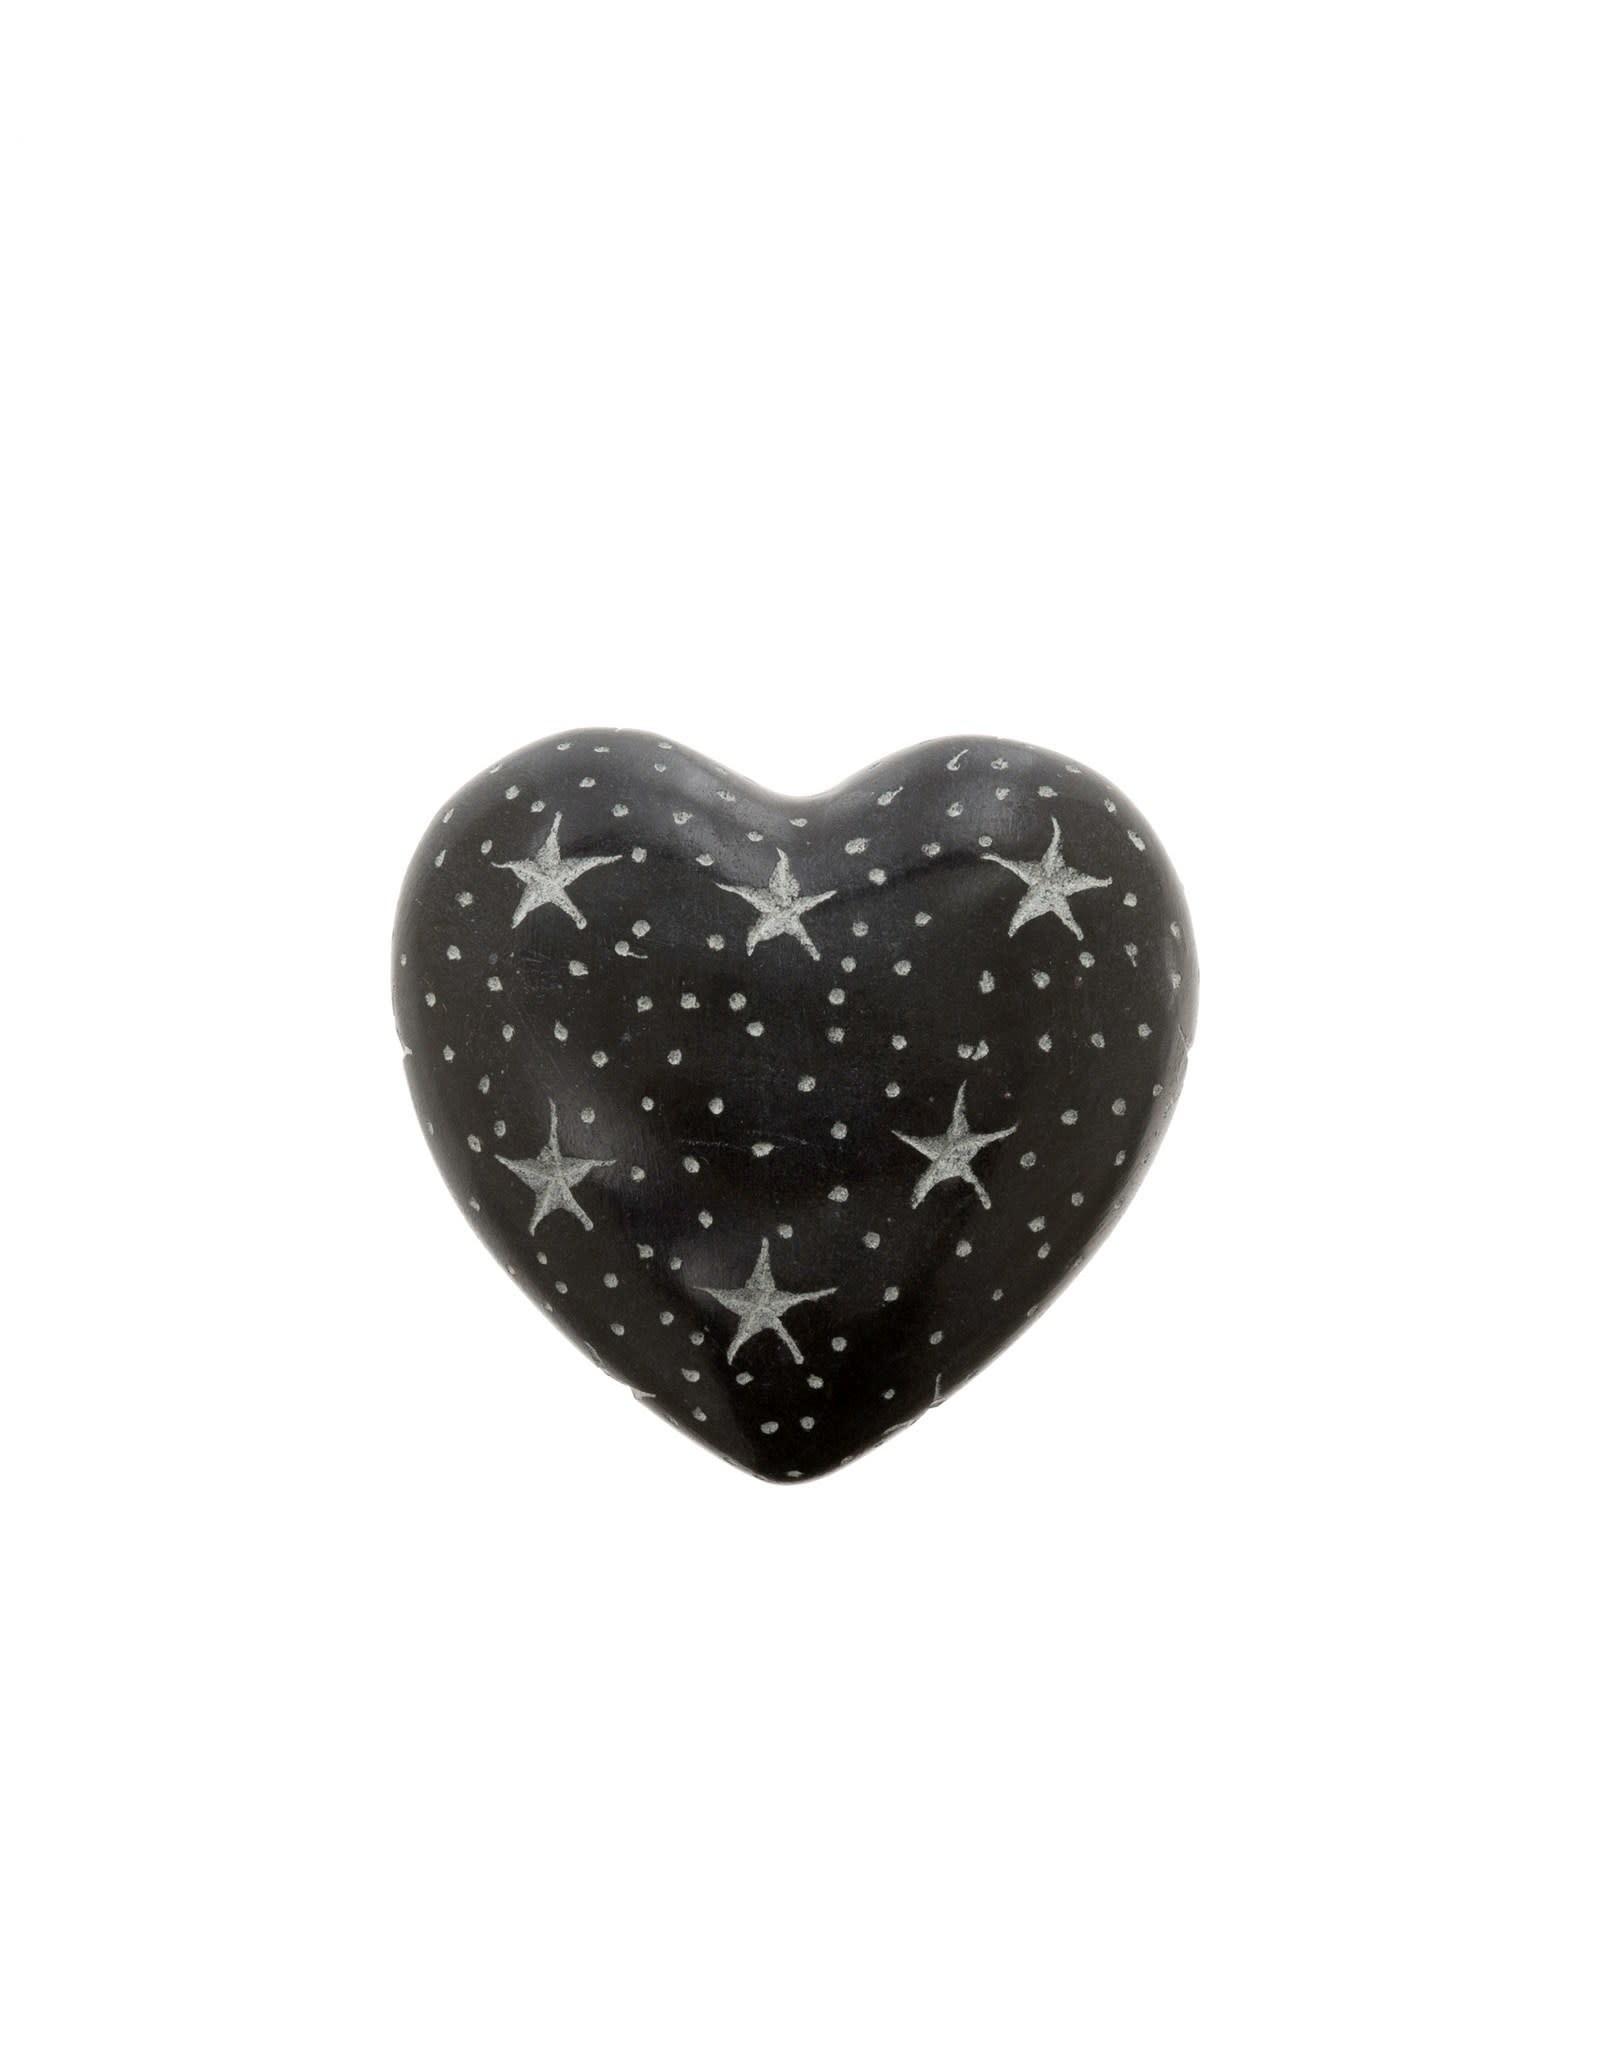 STONE HEART TWILIGHT SOAPSTONE